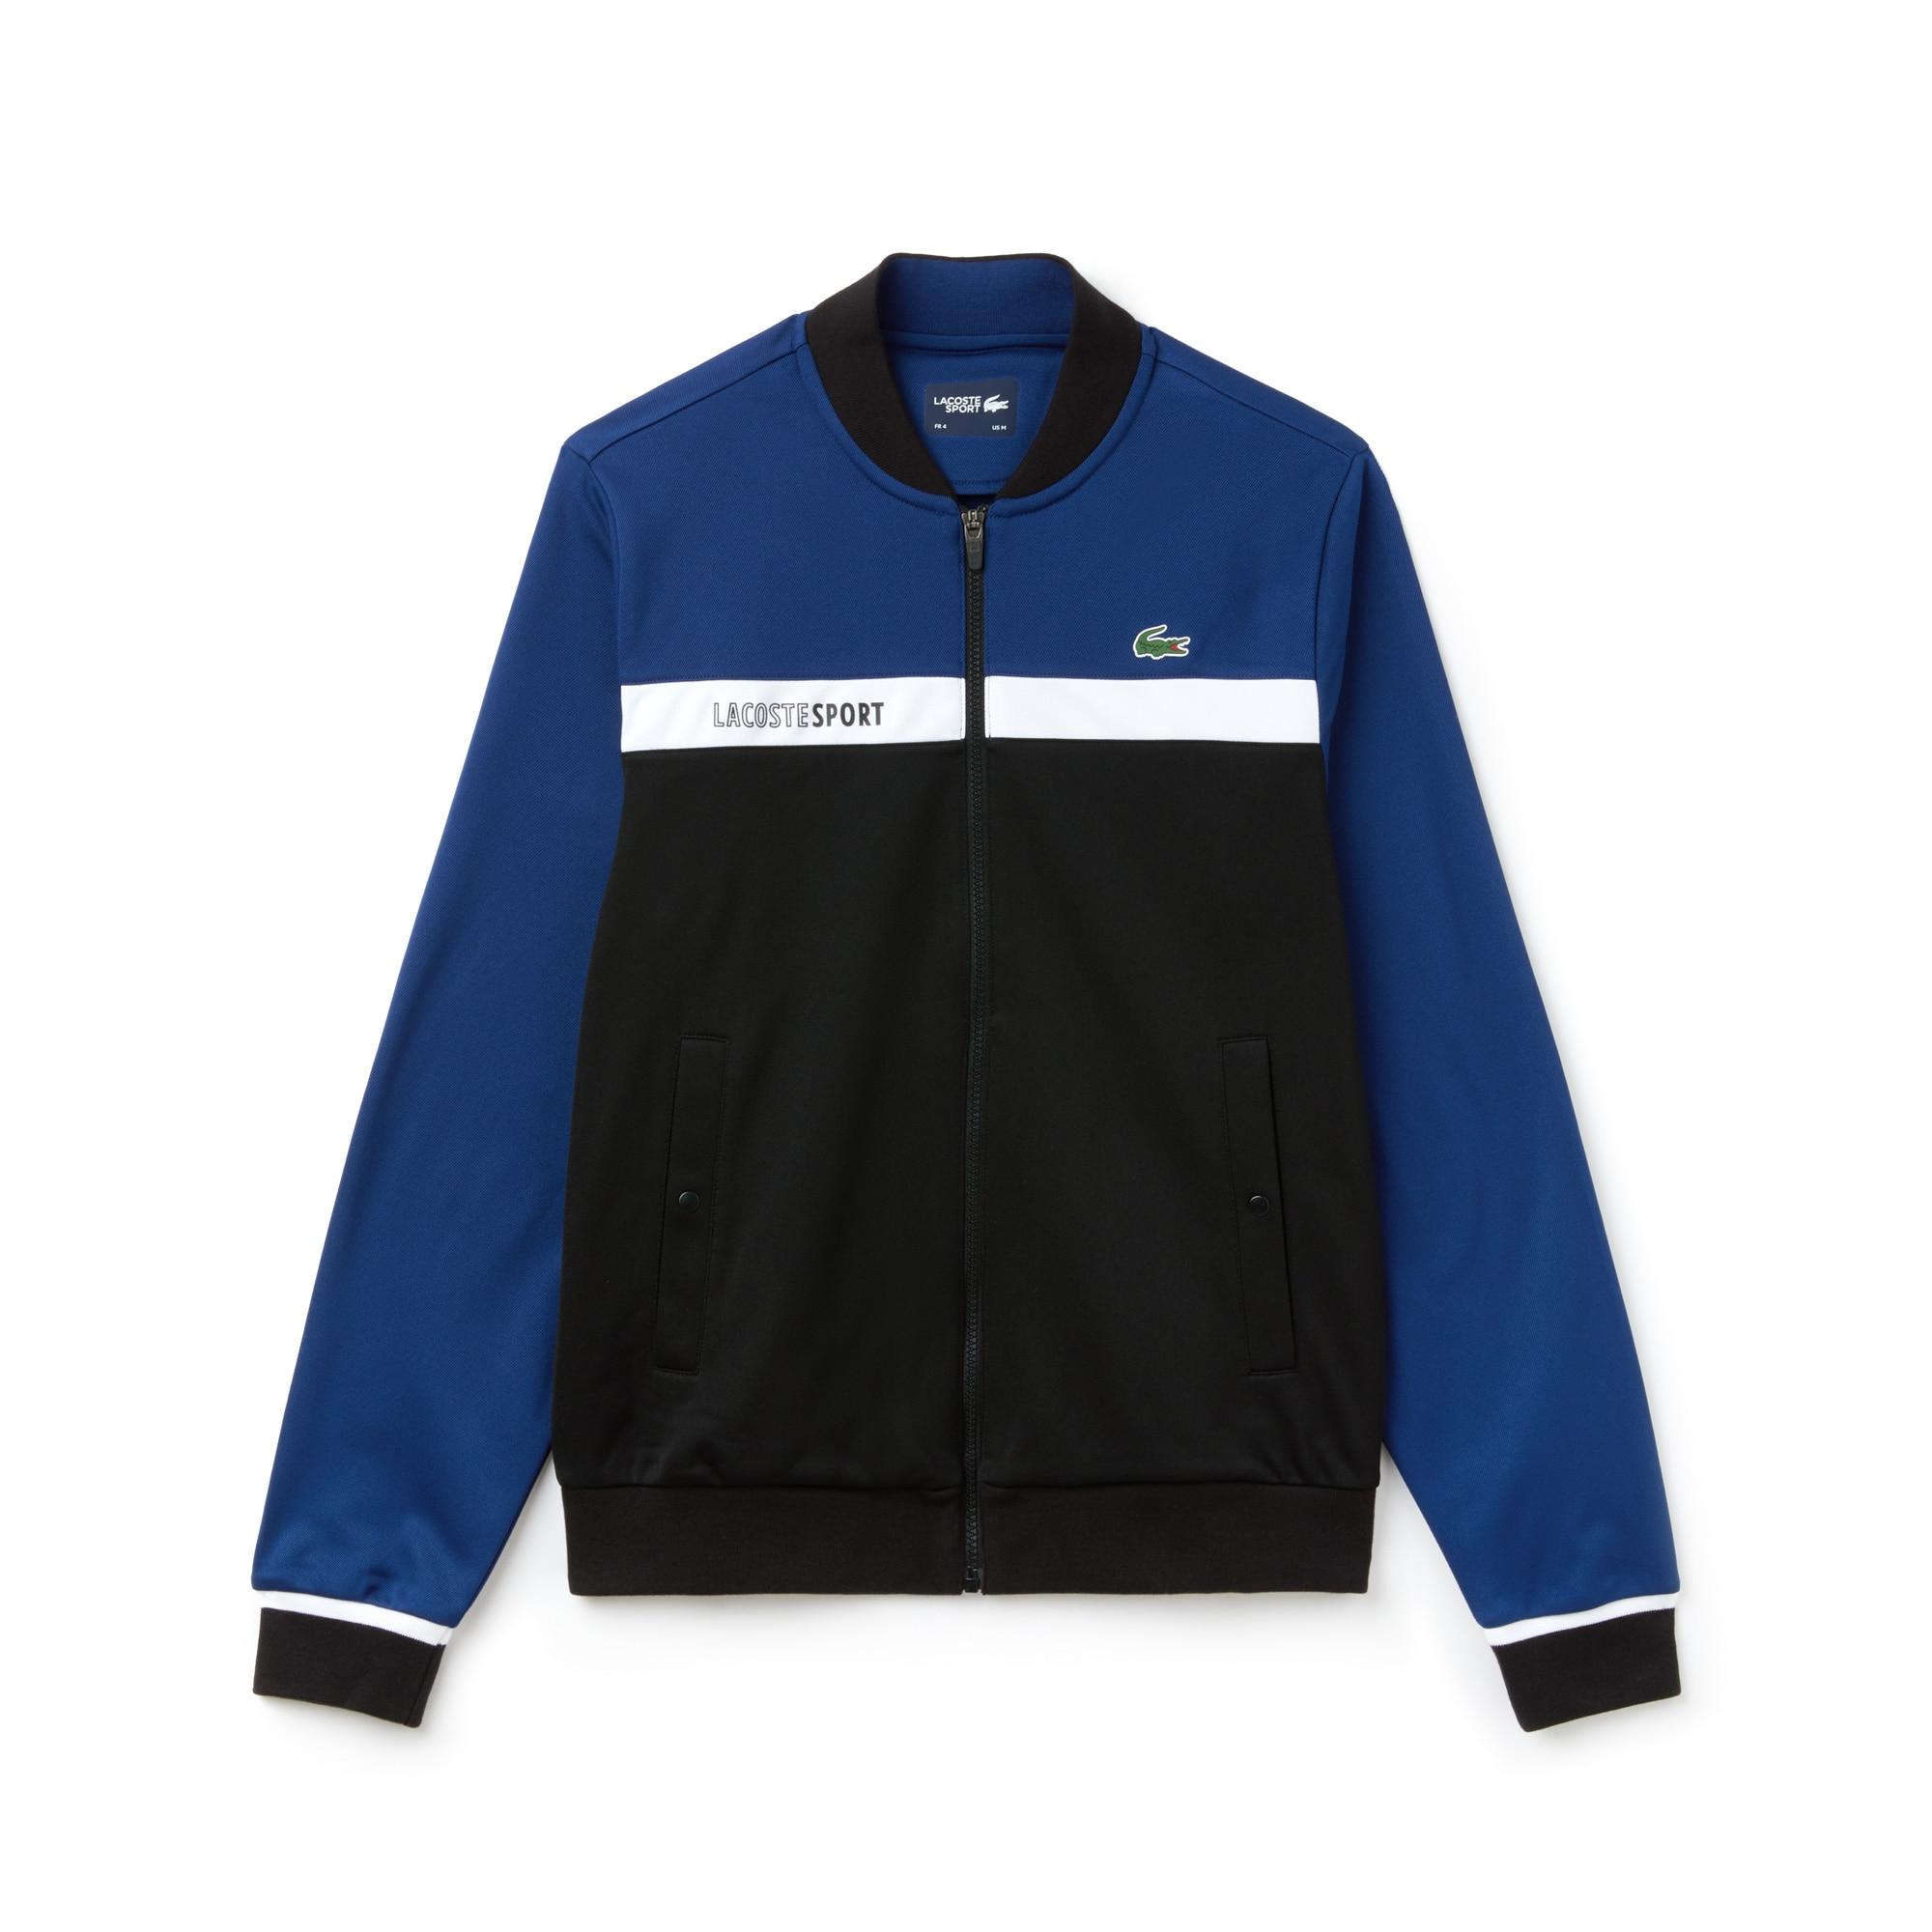 e2f79f4c9 Men s Sweaters